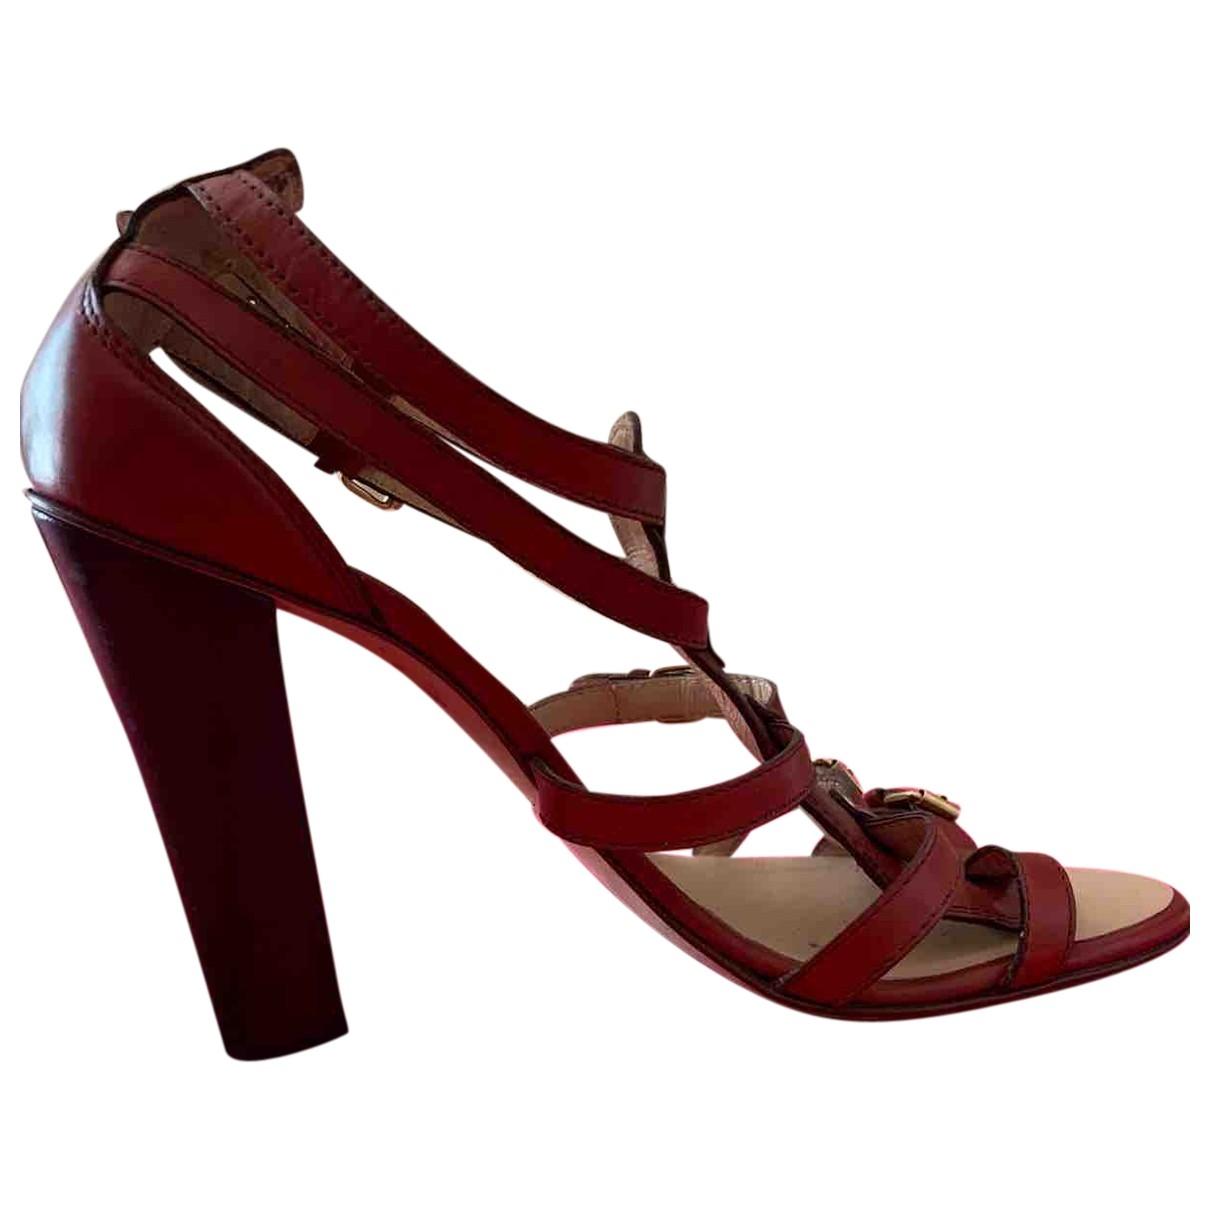 Giuseppe Zanotti \N Burgundy Leather Sandals for Women 40 EU